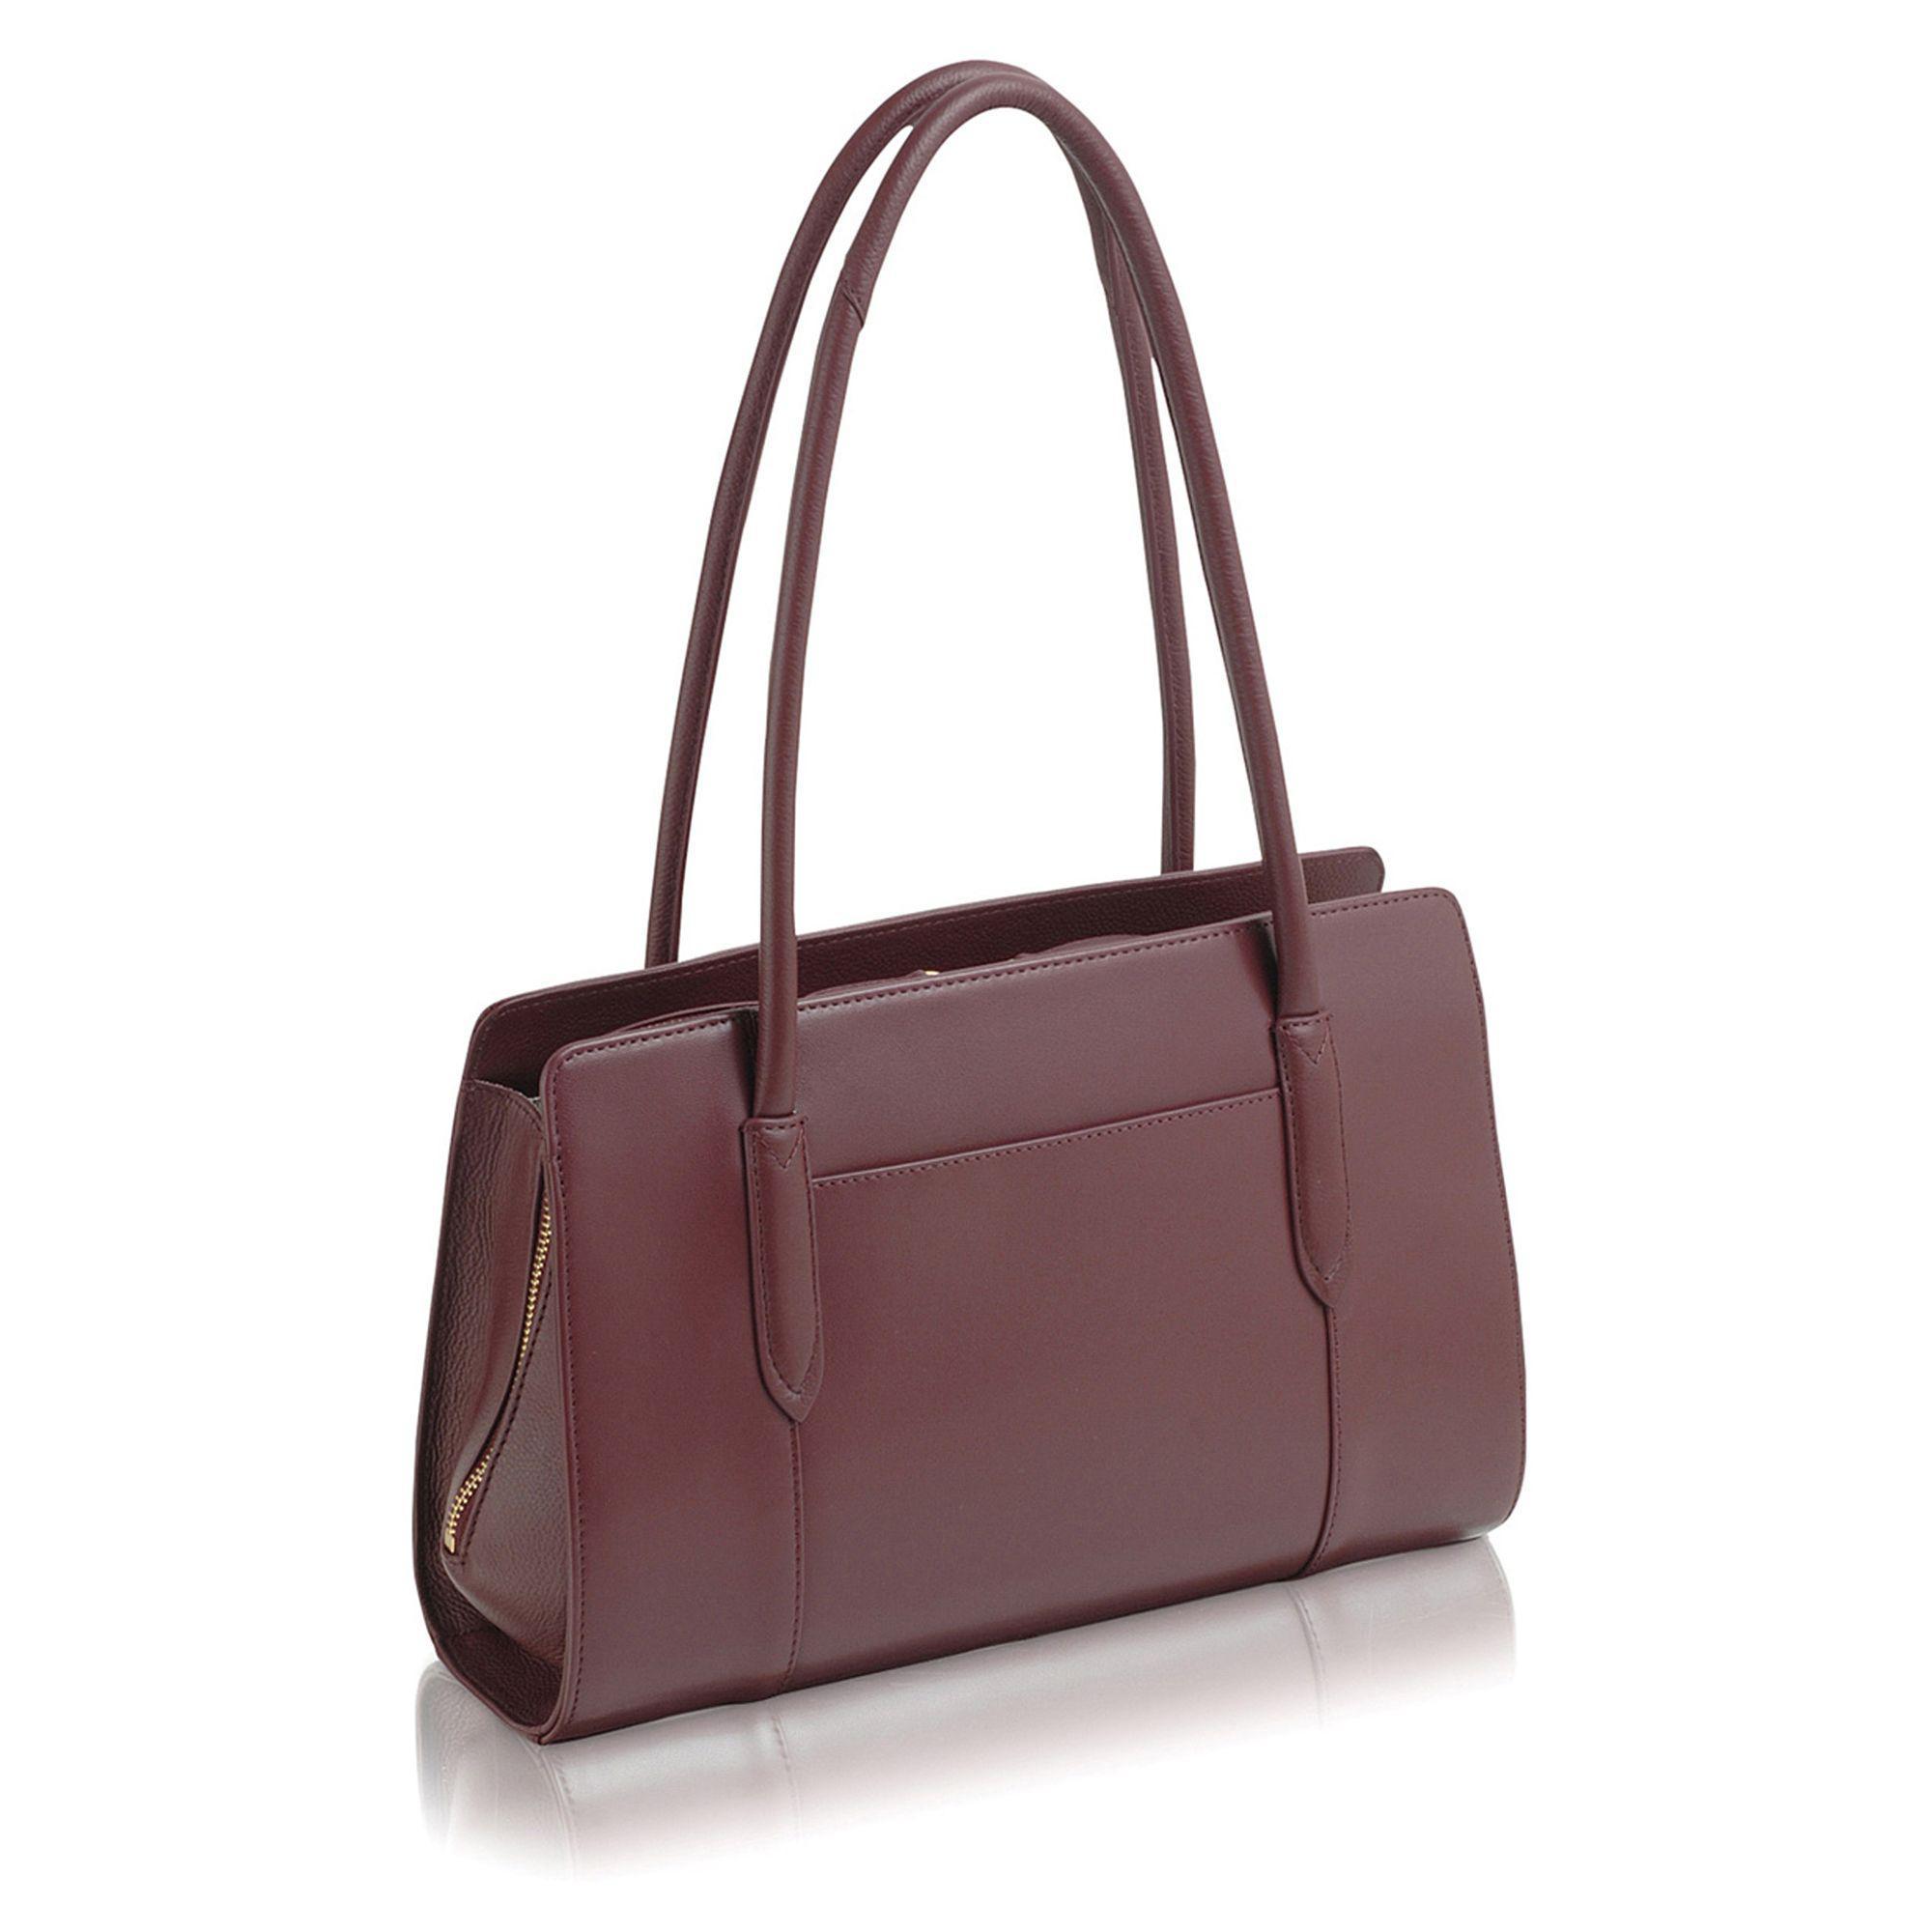 Radley Medium Leather 'liverpool Street' Tote Bag in Dark Red (Red)